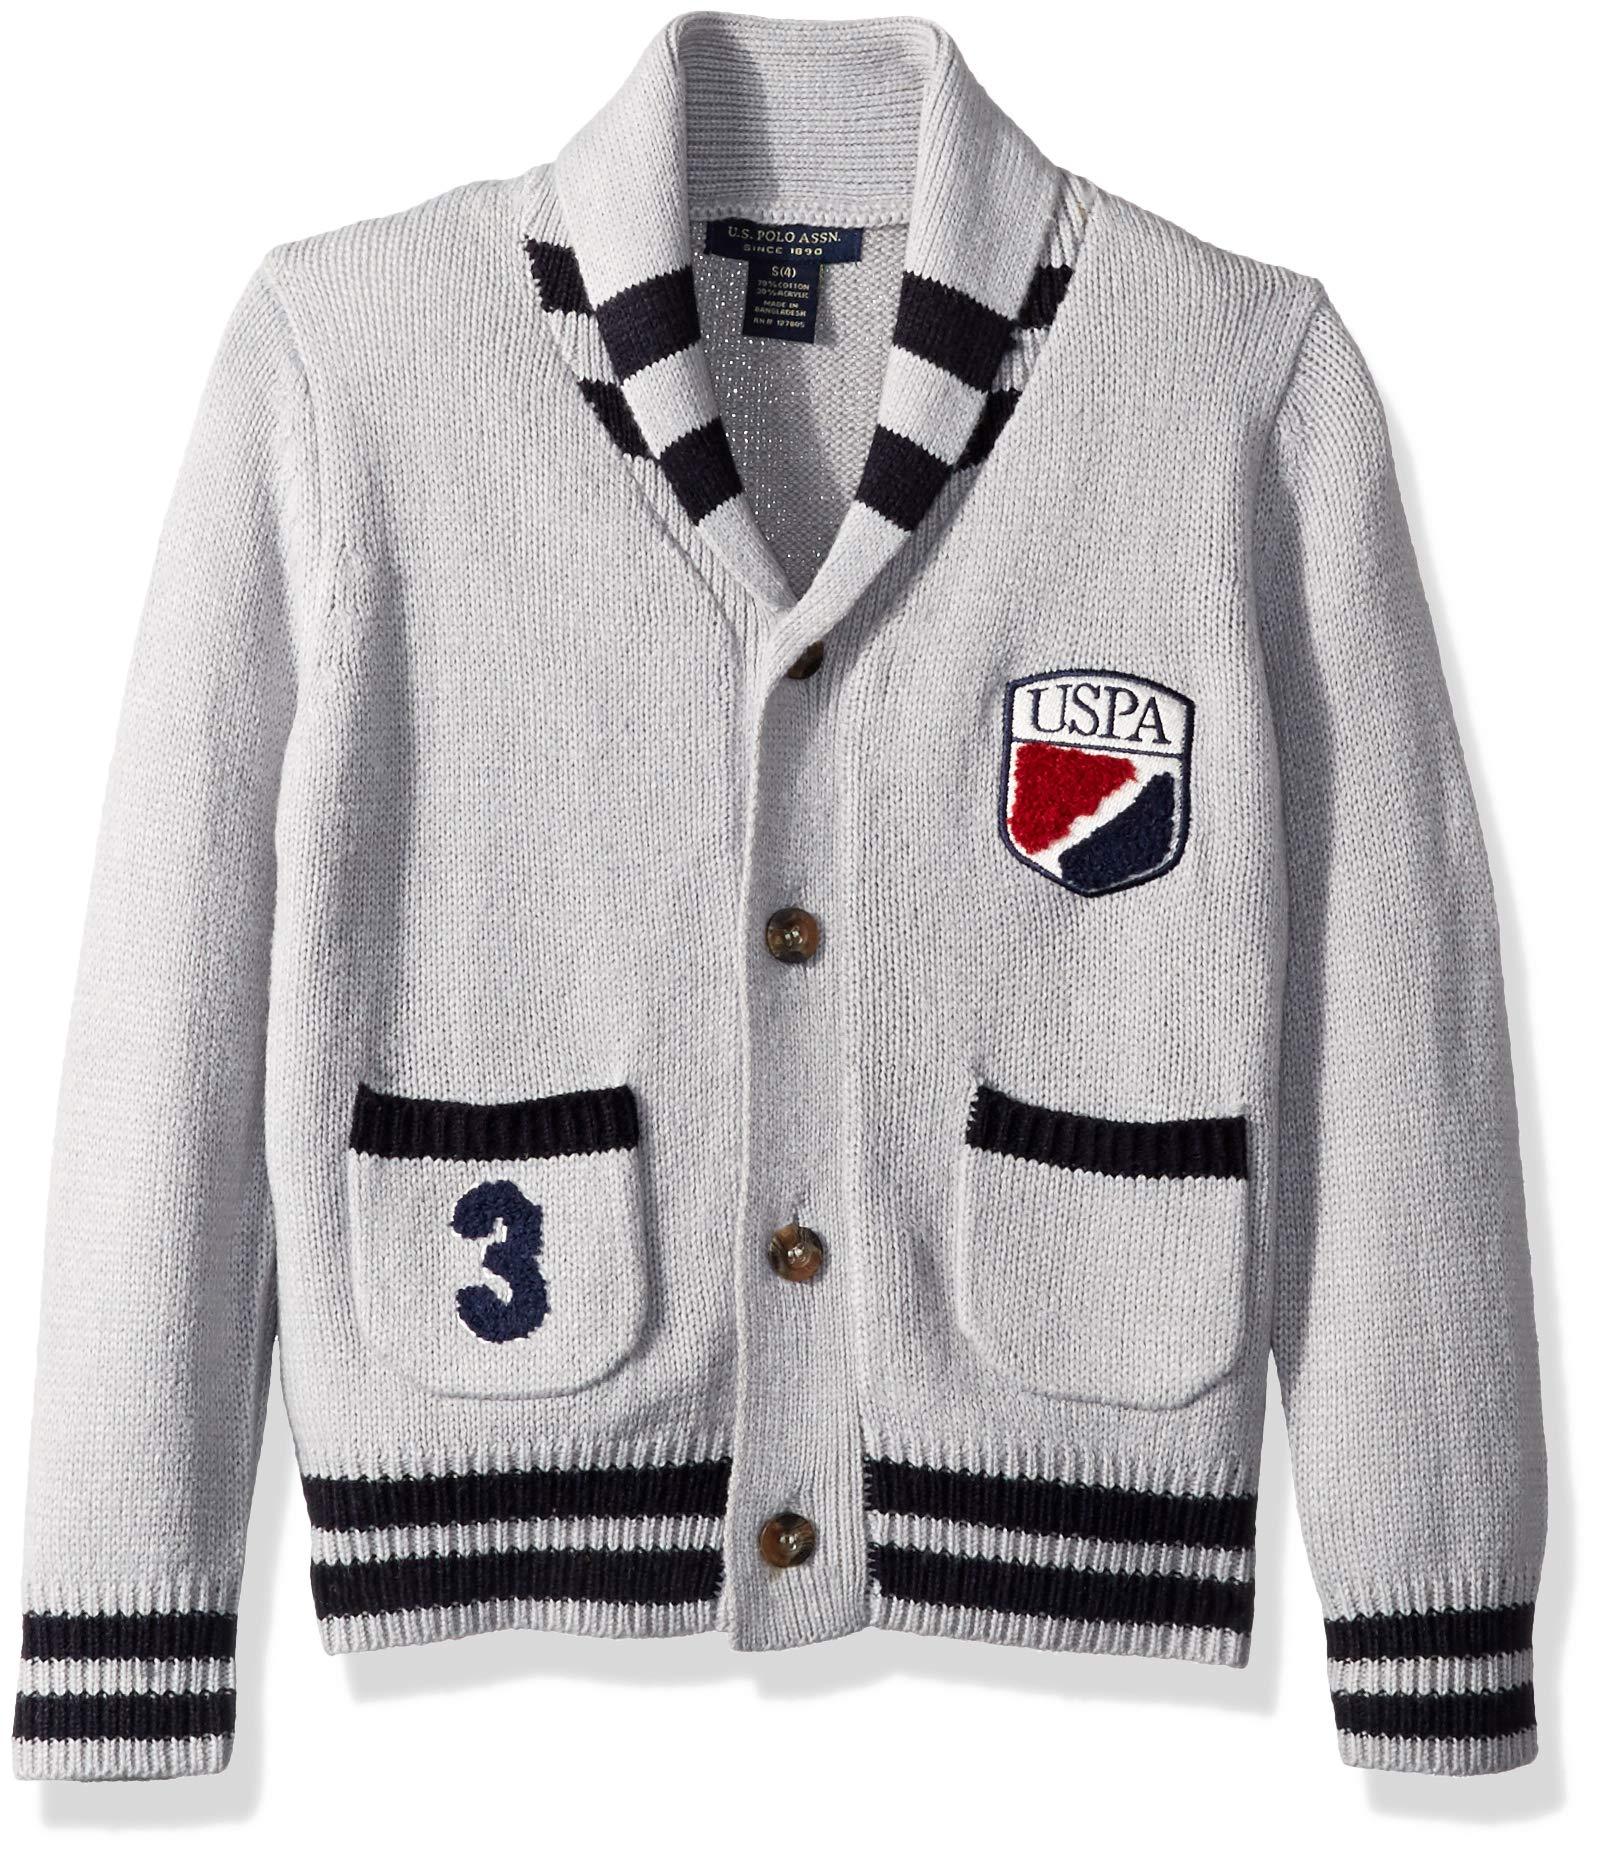 U.S. Polo Assn. Boys' Little Cardigan Sweater, Cool School Light Heather Gray, 5/6